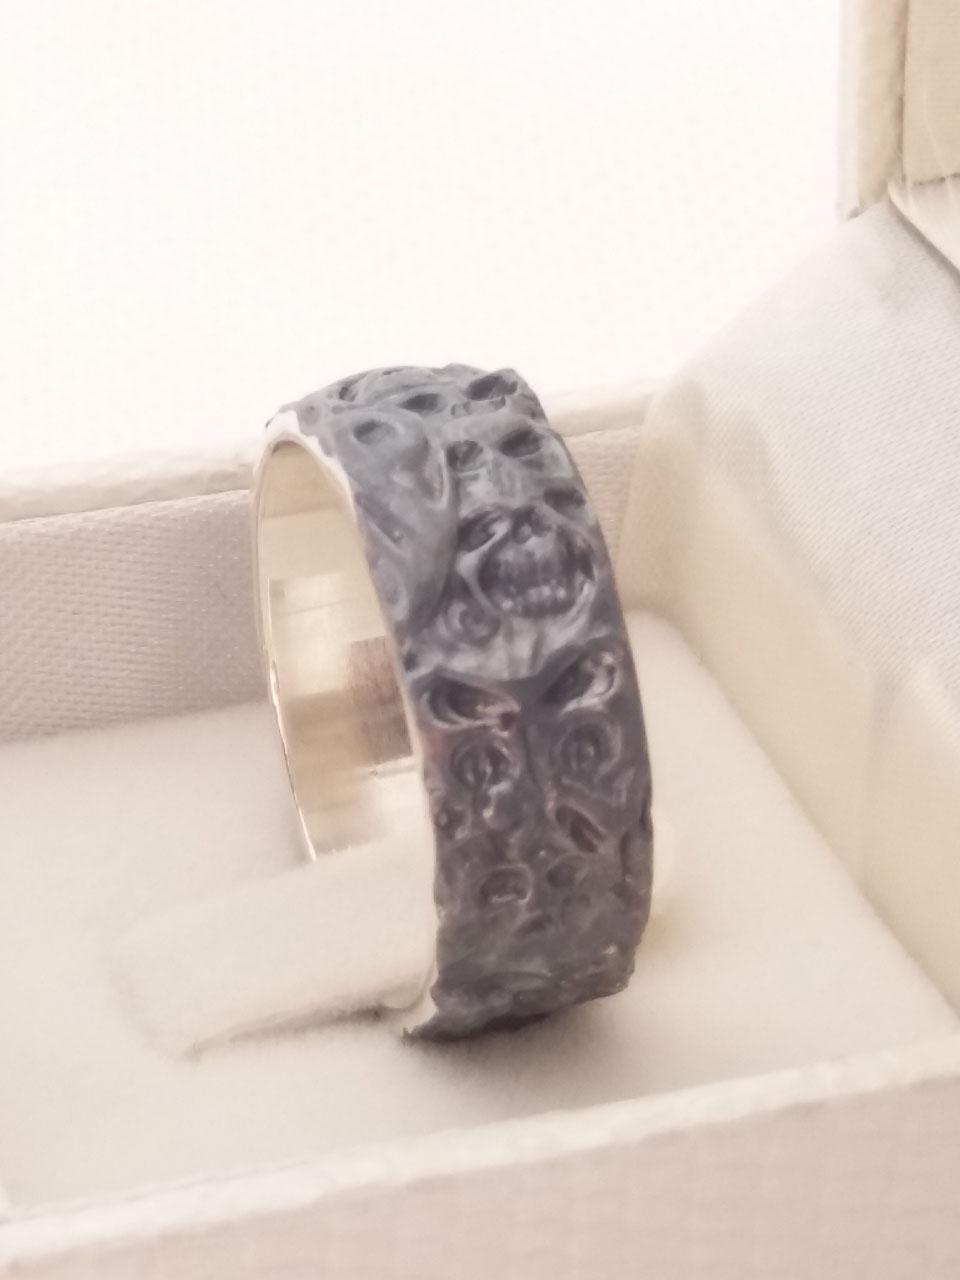 bikers skull ring pattern ring silver skull ring Ring of Demons Man Skull Ring Gothic jewelry